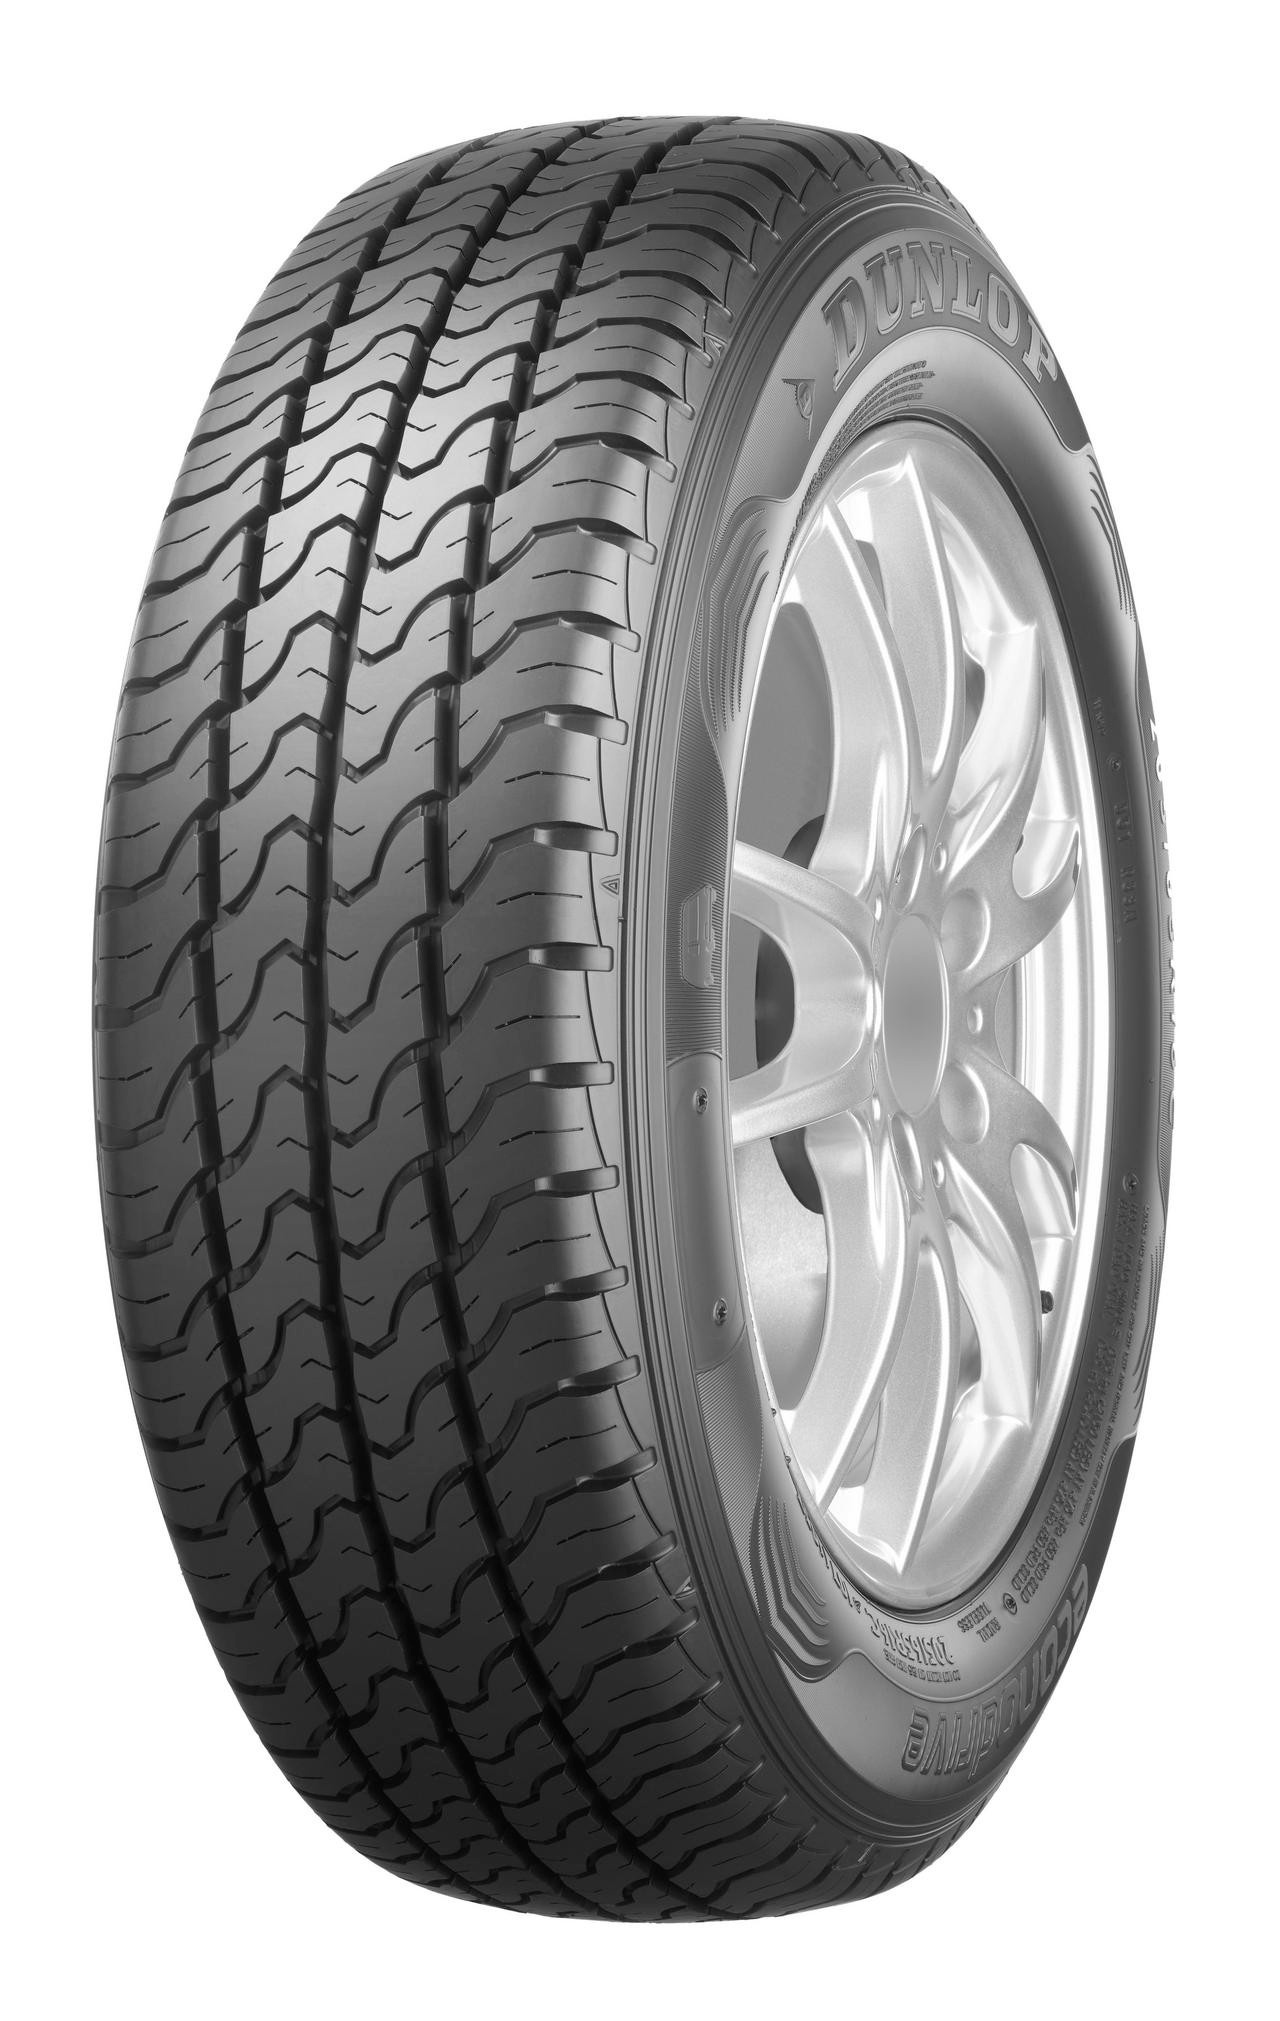 Dunlop Econodrive 185/80R14C 102/100R